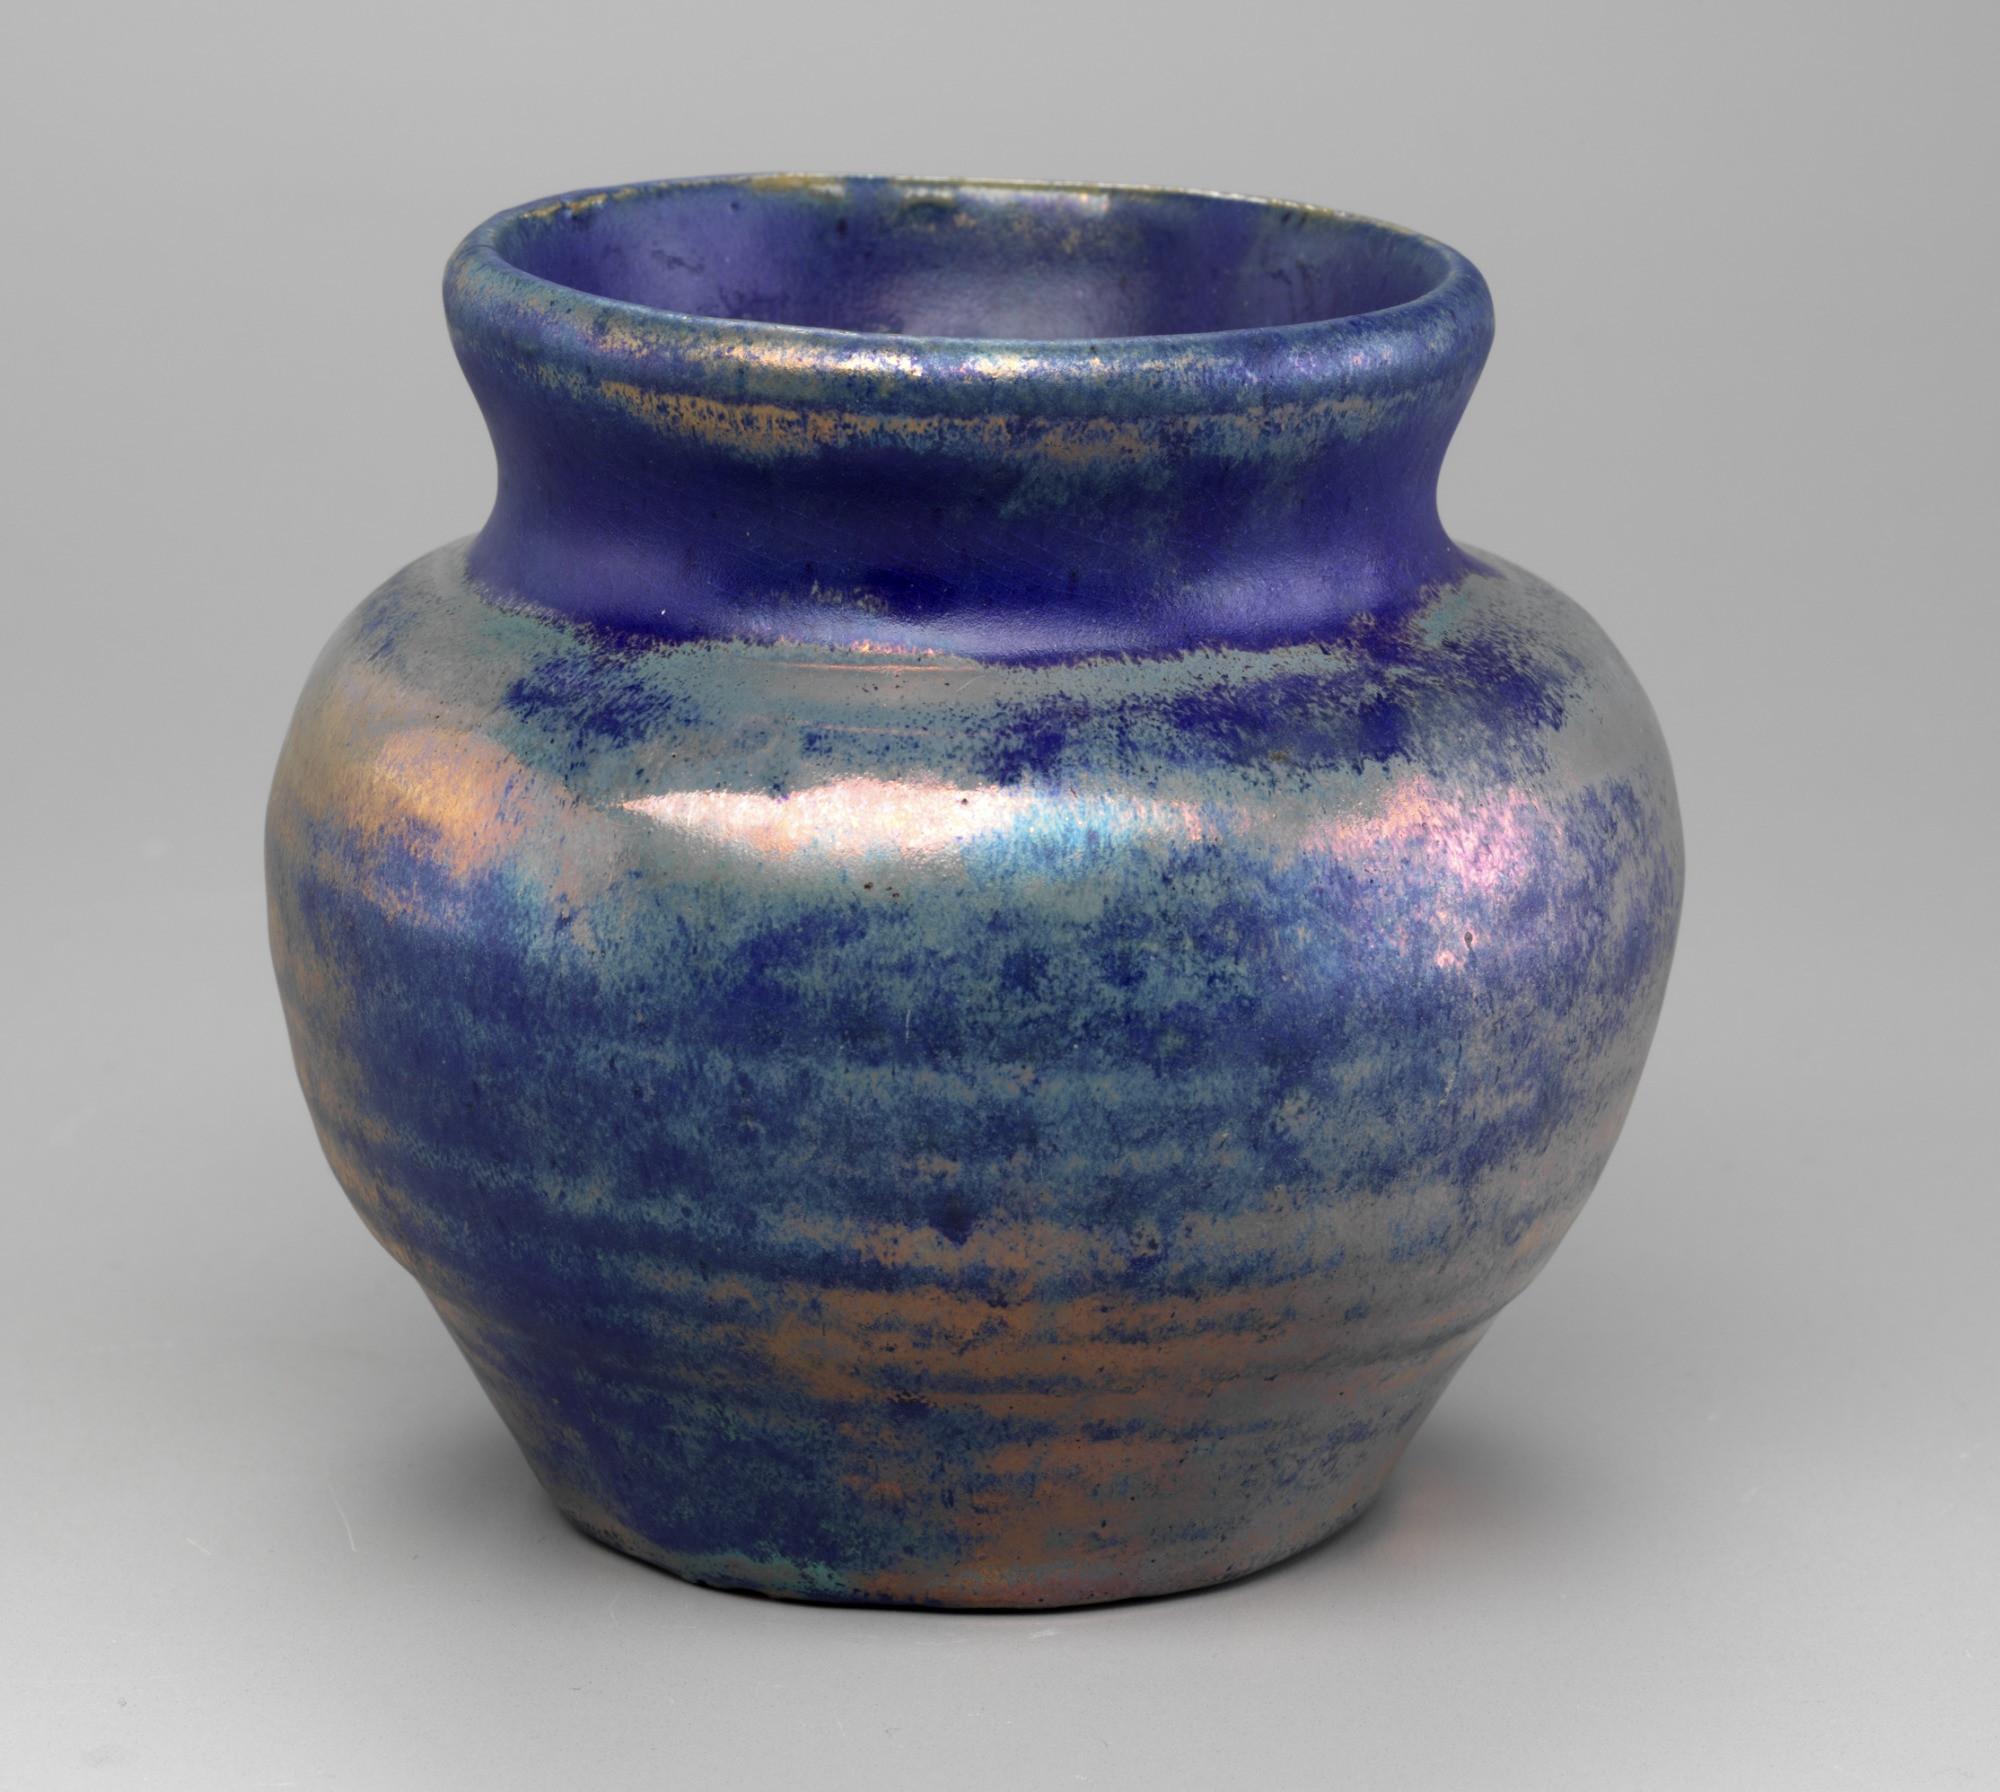 ralph lauren sloane vase of vase detroit institute of arts museum throughout pewabic vase between 1910 and 1915 glazed earthenware detroit institute of arts